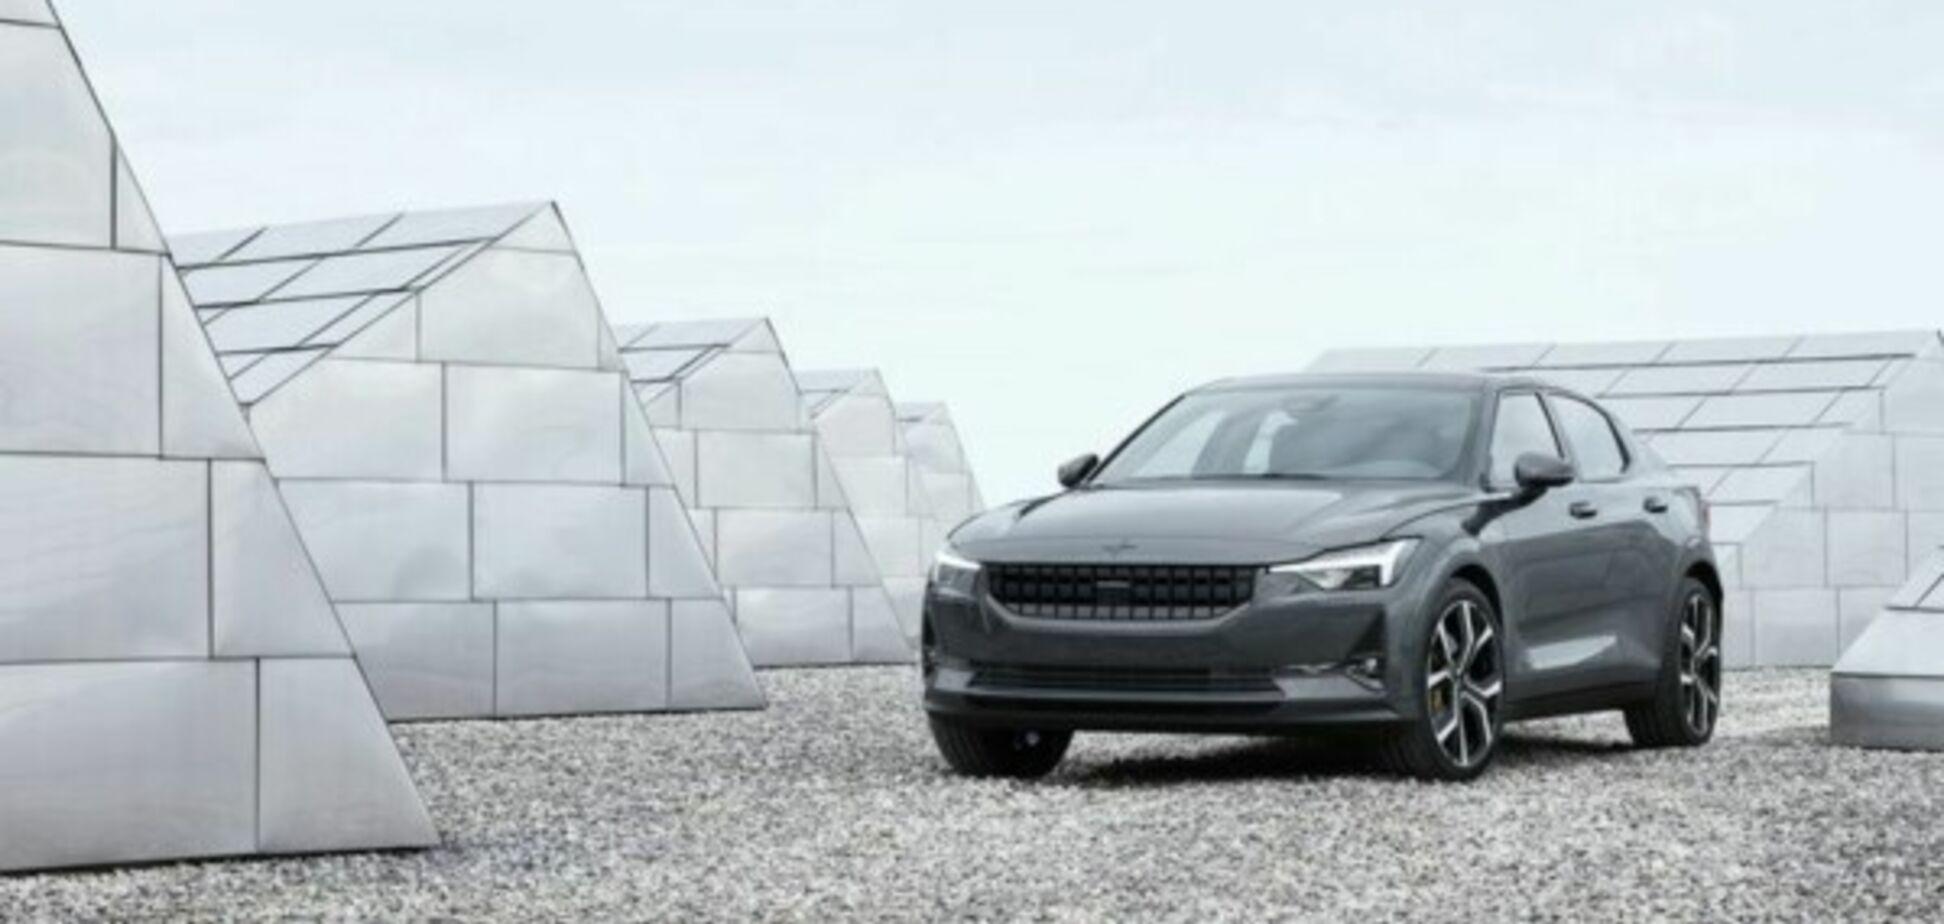 Гонка характеристик: электрокар Volvo обошел Model 3